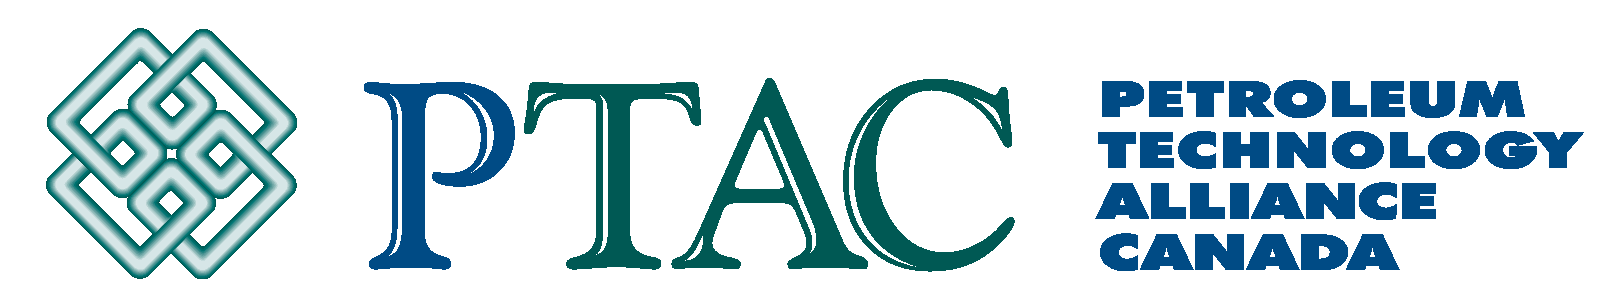 Petroleum Technology Alliance Canada (PTAC)